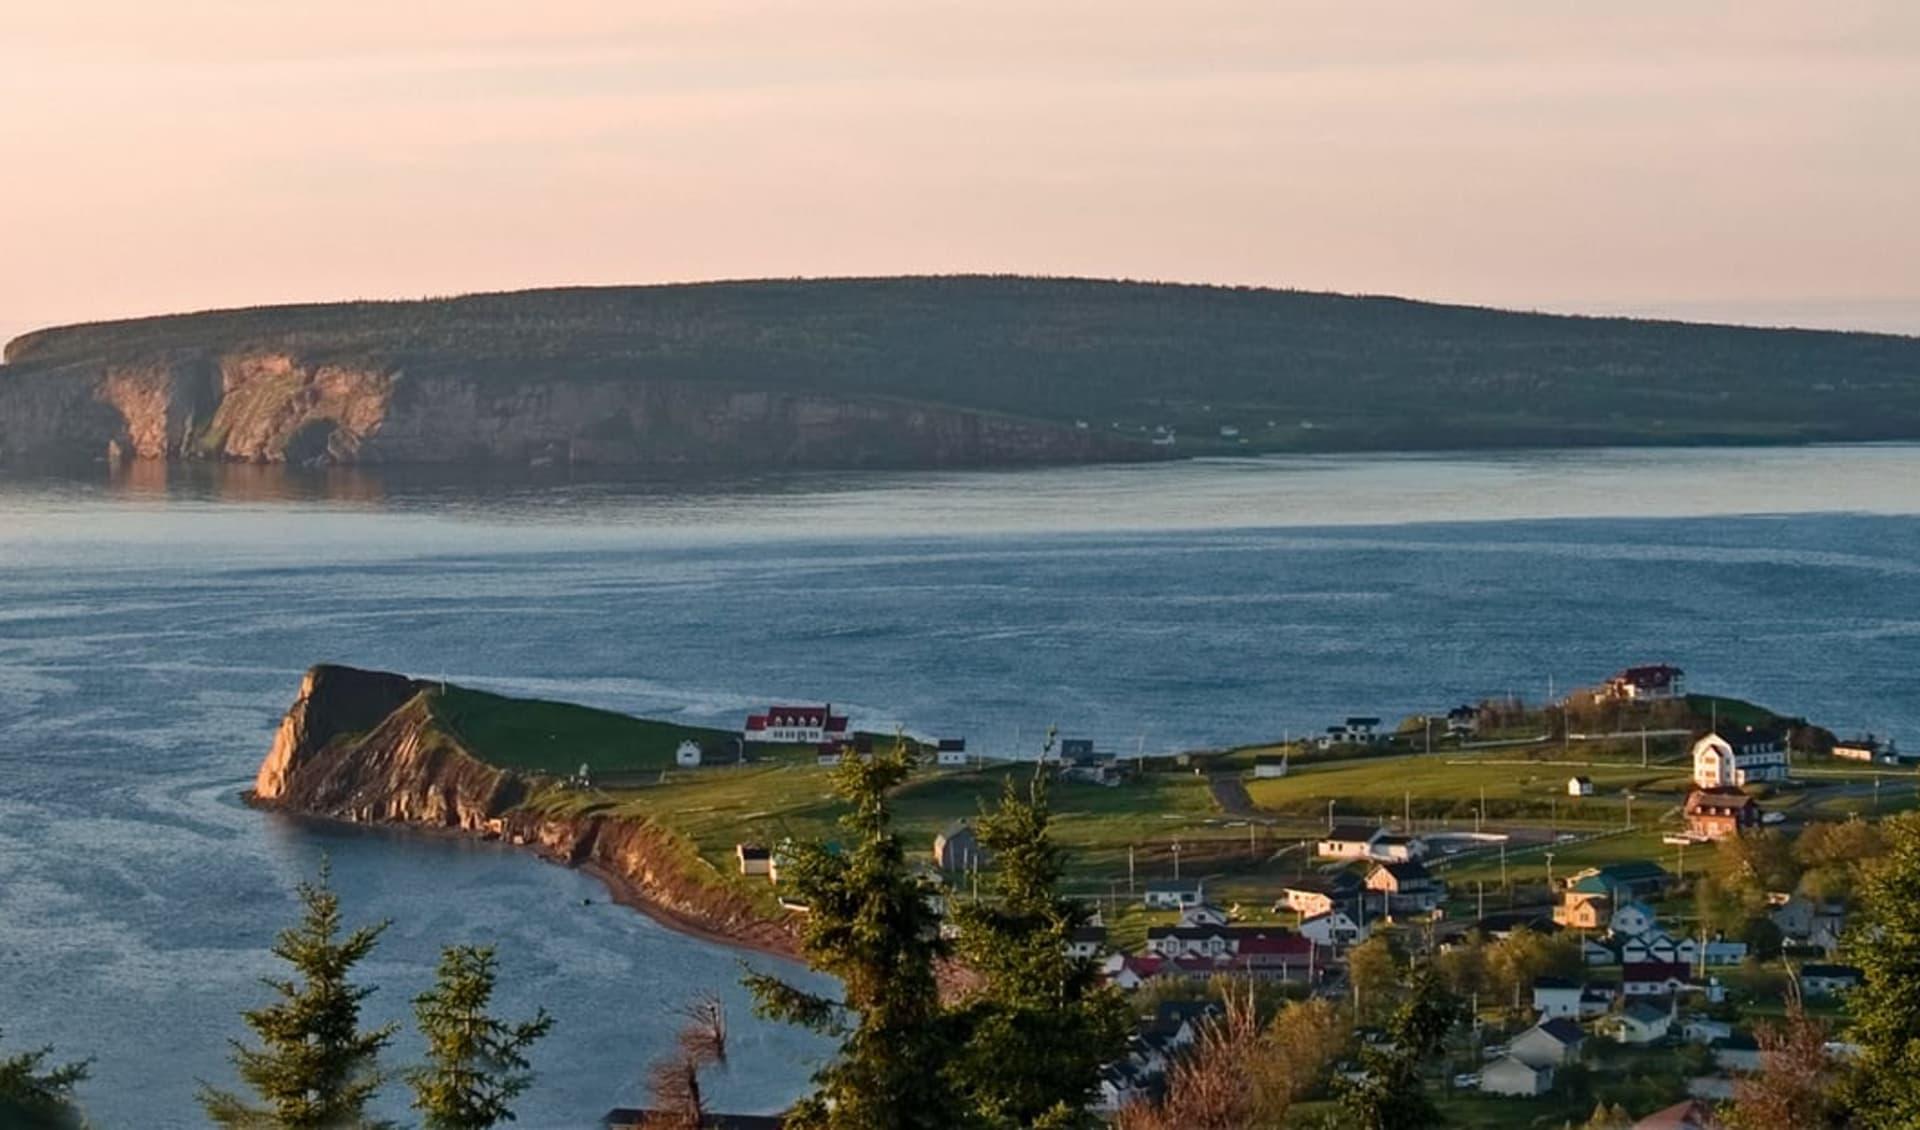 Bezauberndes Ostkanada ab Halifax: Ostkanada - Québec - Le Rocher-Percé